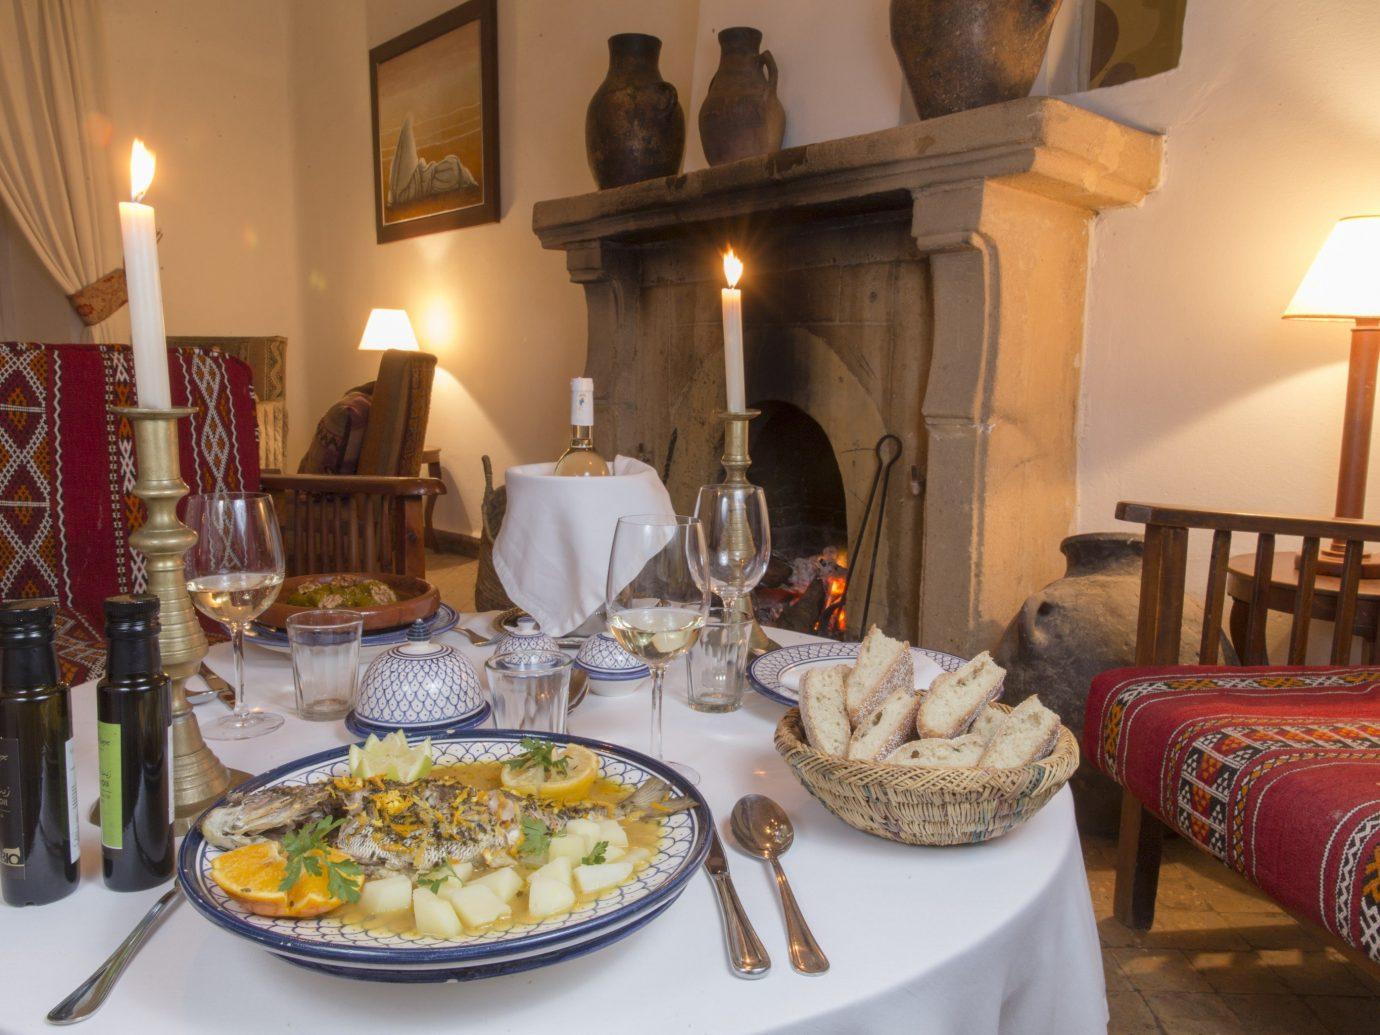 Trip Ideas table plate indoor room meal restaurant estate home interior design Drink dinner set dining table